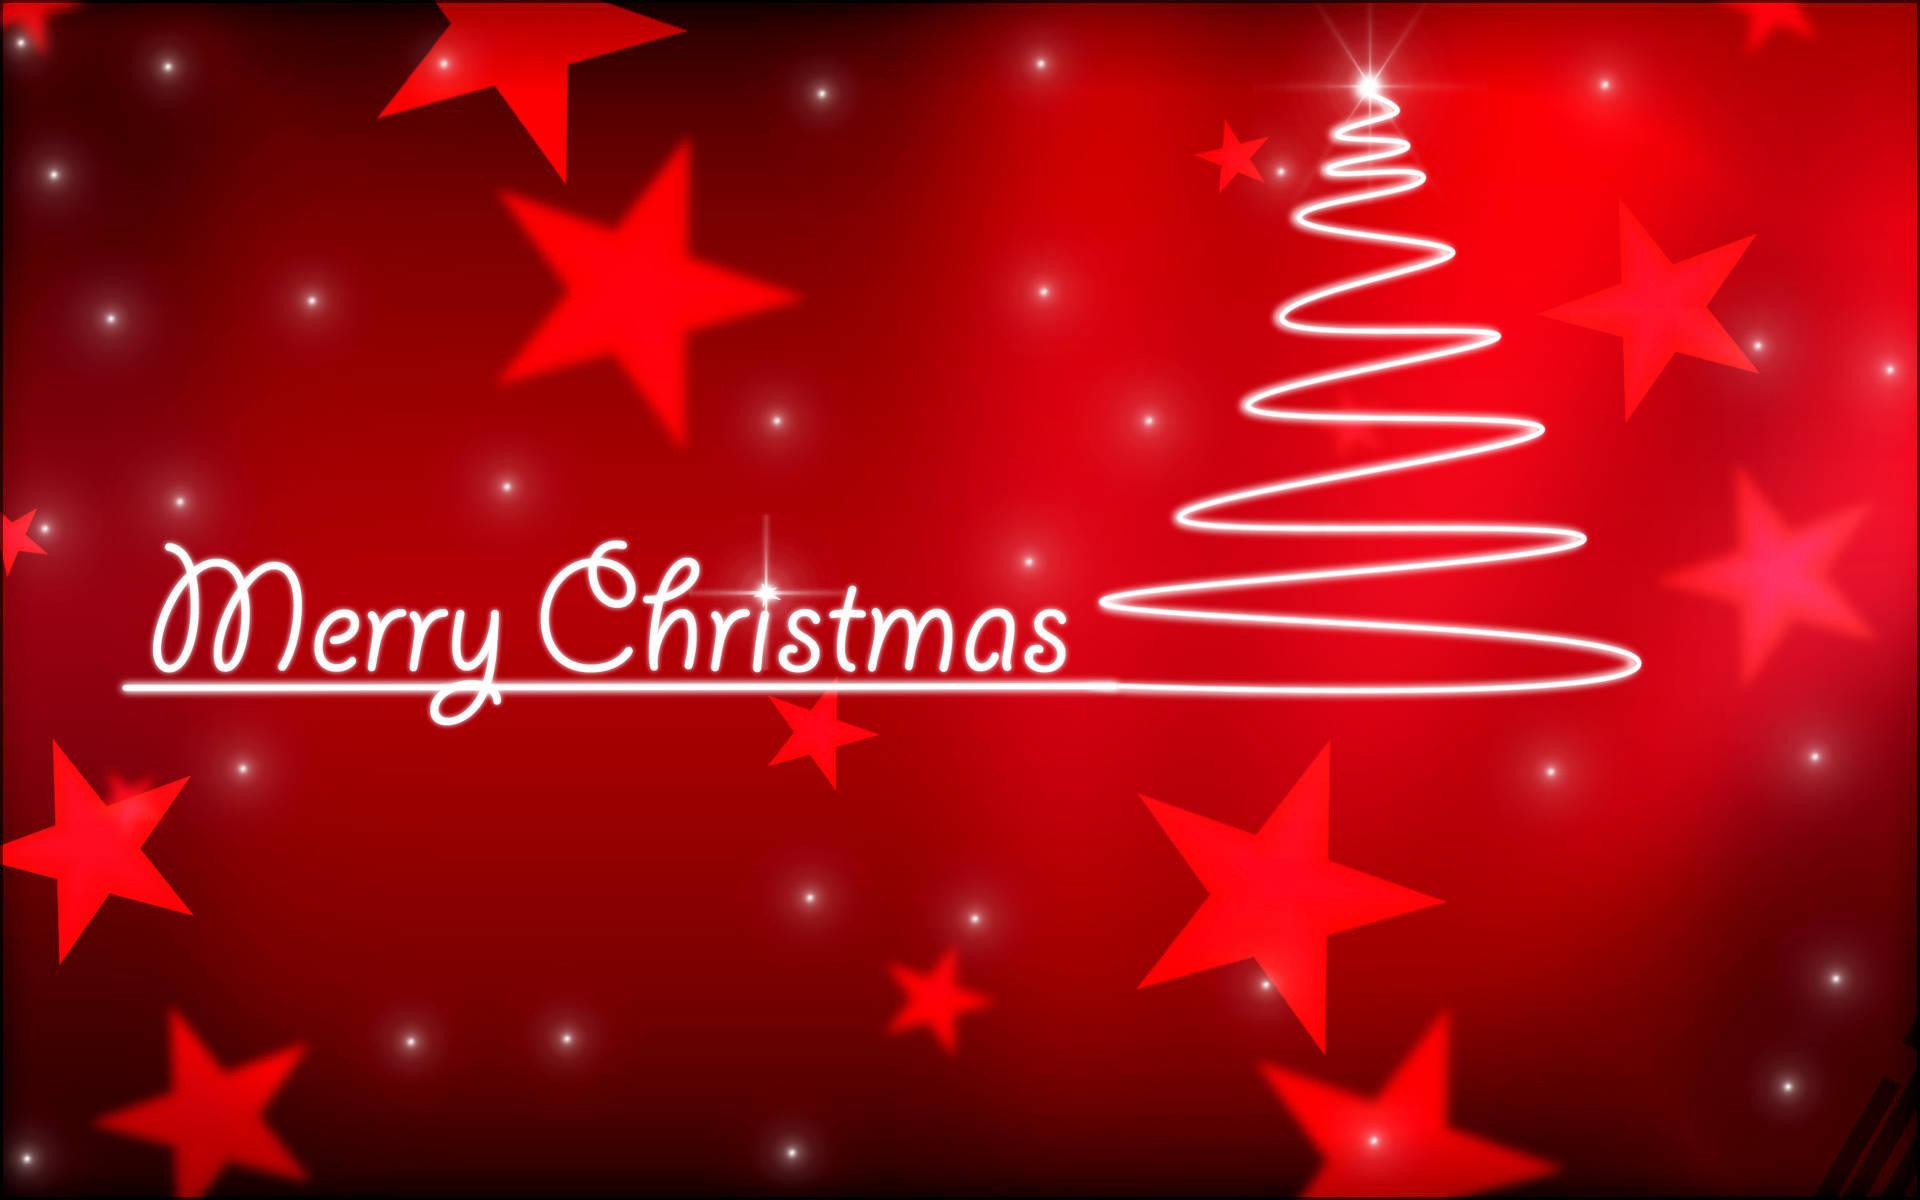 1ac095574f02edf6d991_merry_christmas1.jpg